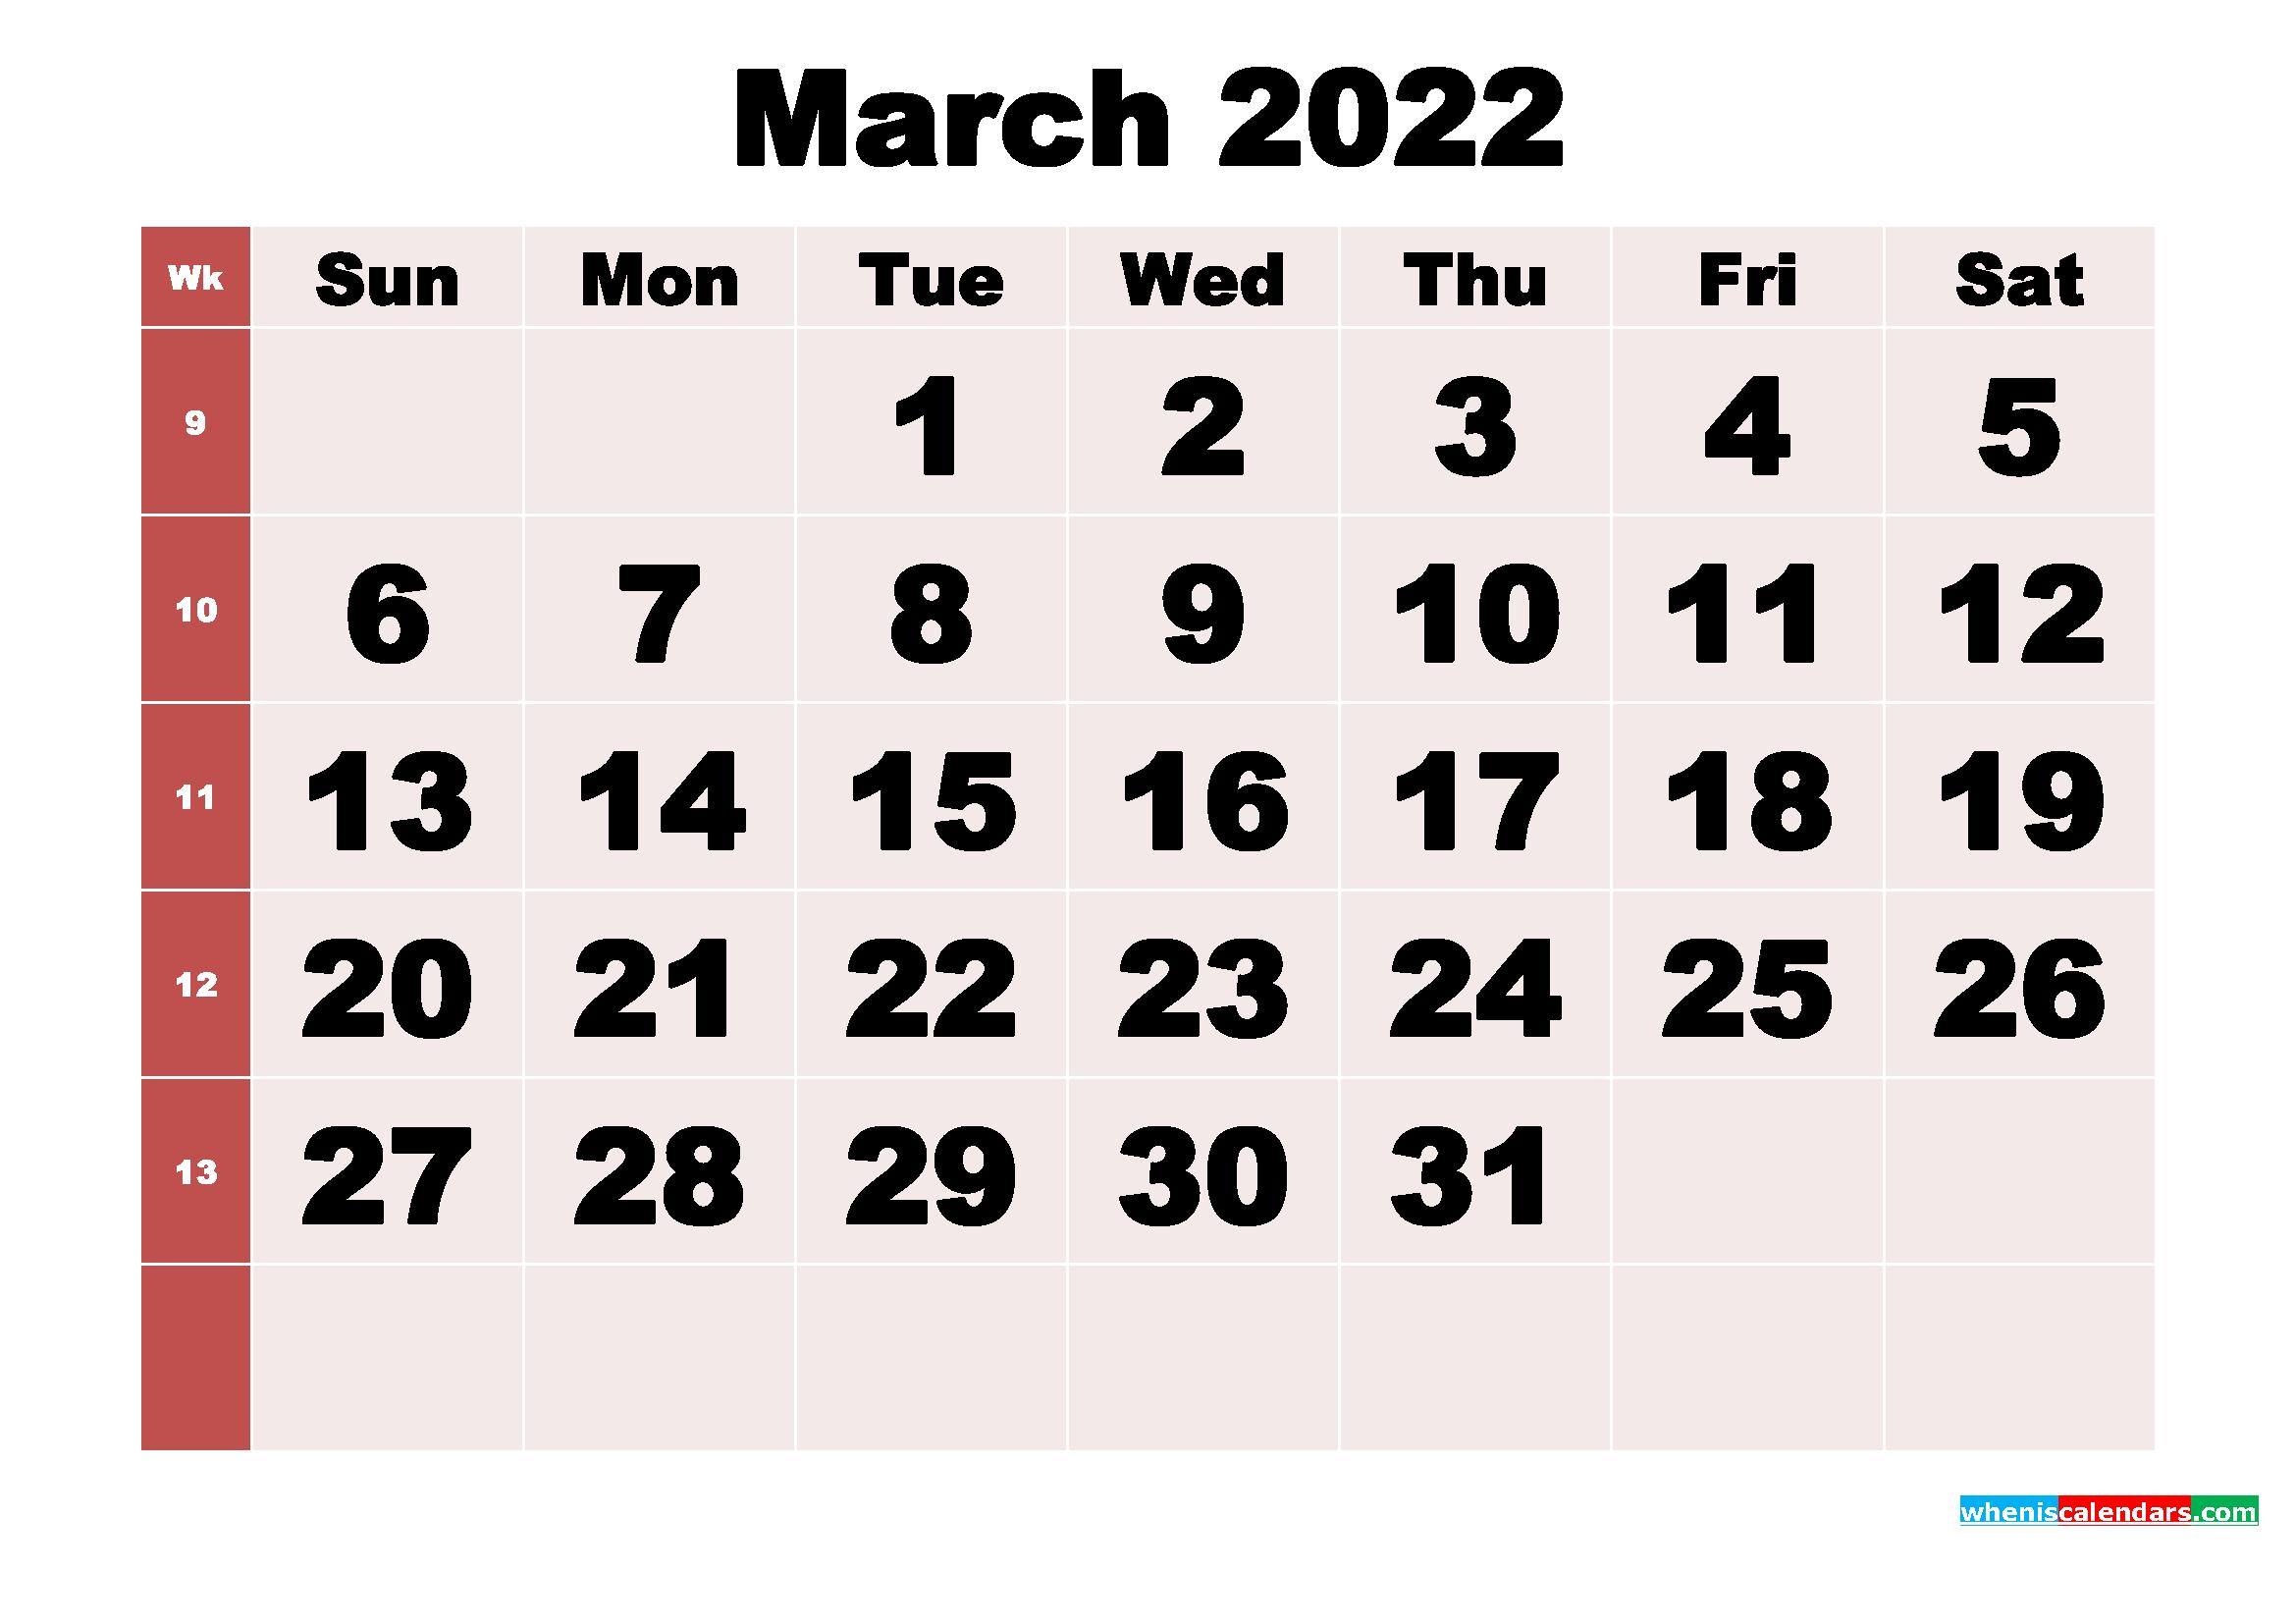 Free Printable Monthly Calendar March 2022 regarding 2022 Weekly Planner Printable Image